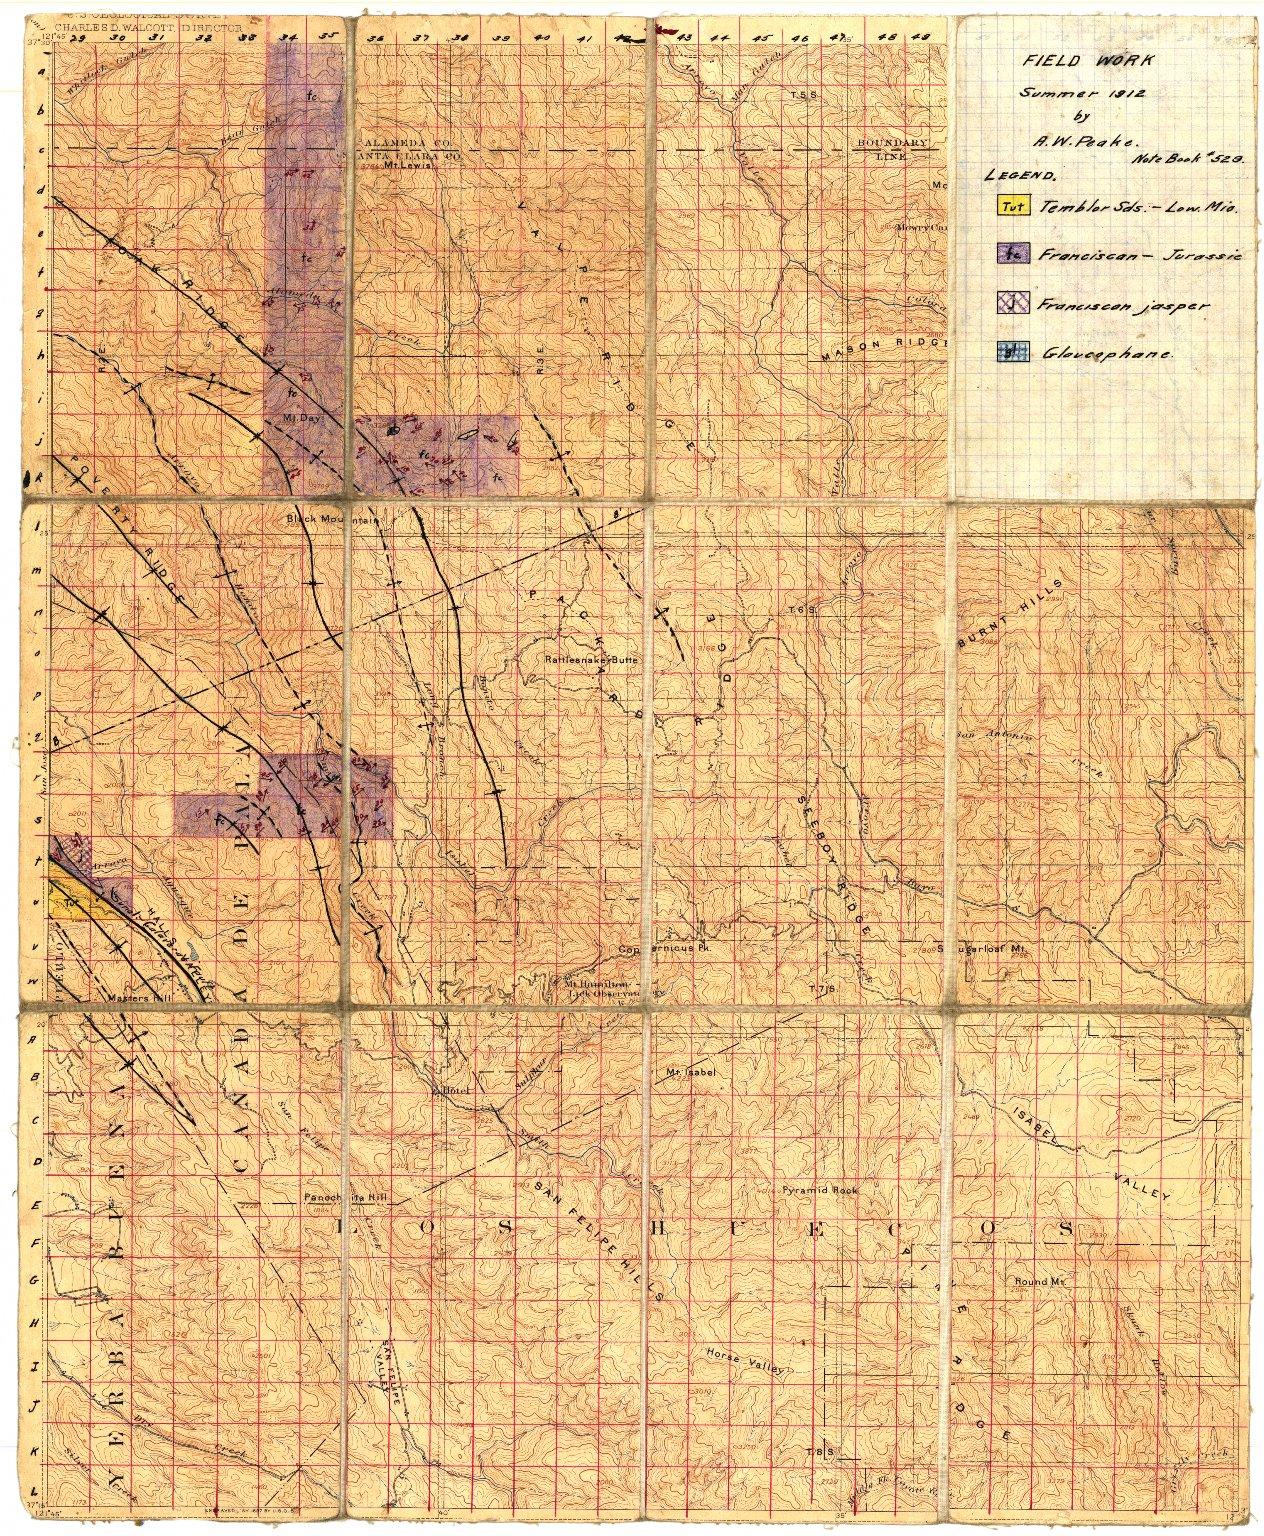 California, Mt. Hamilton sheet: